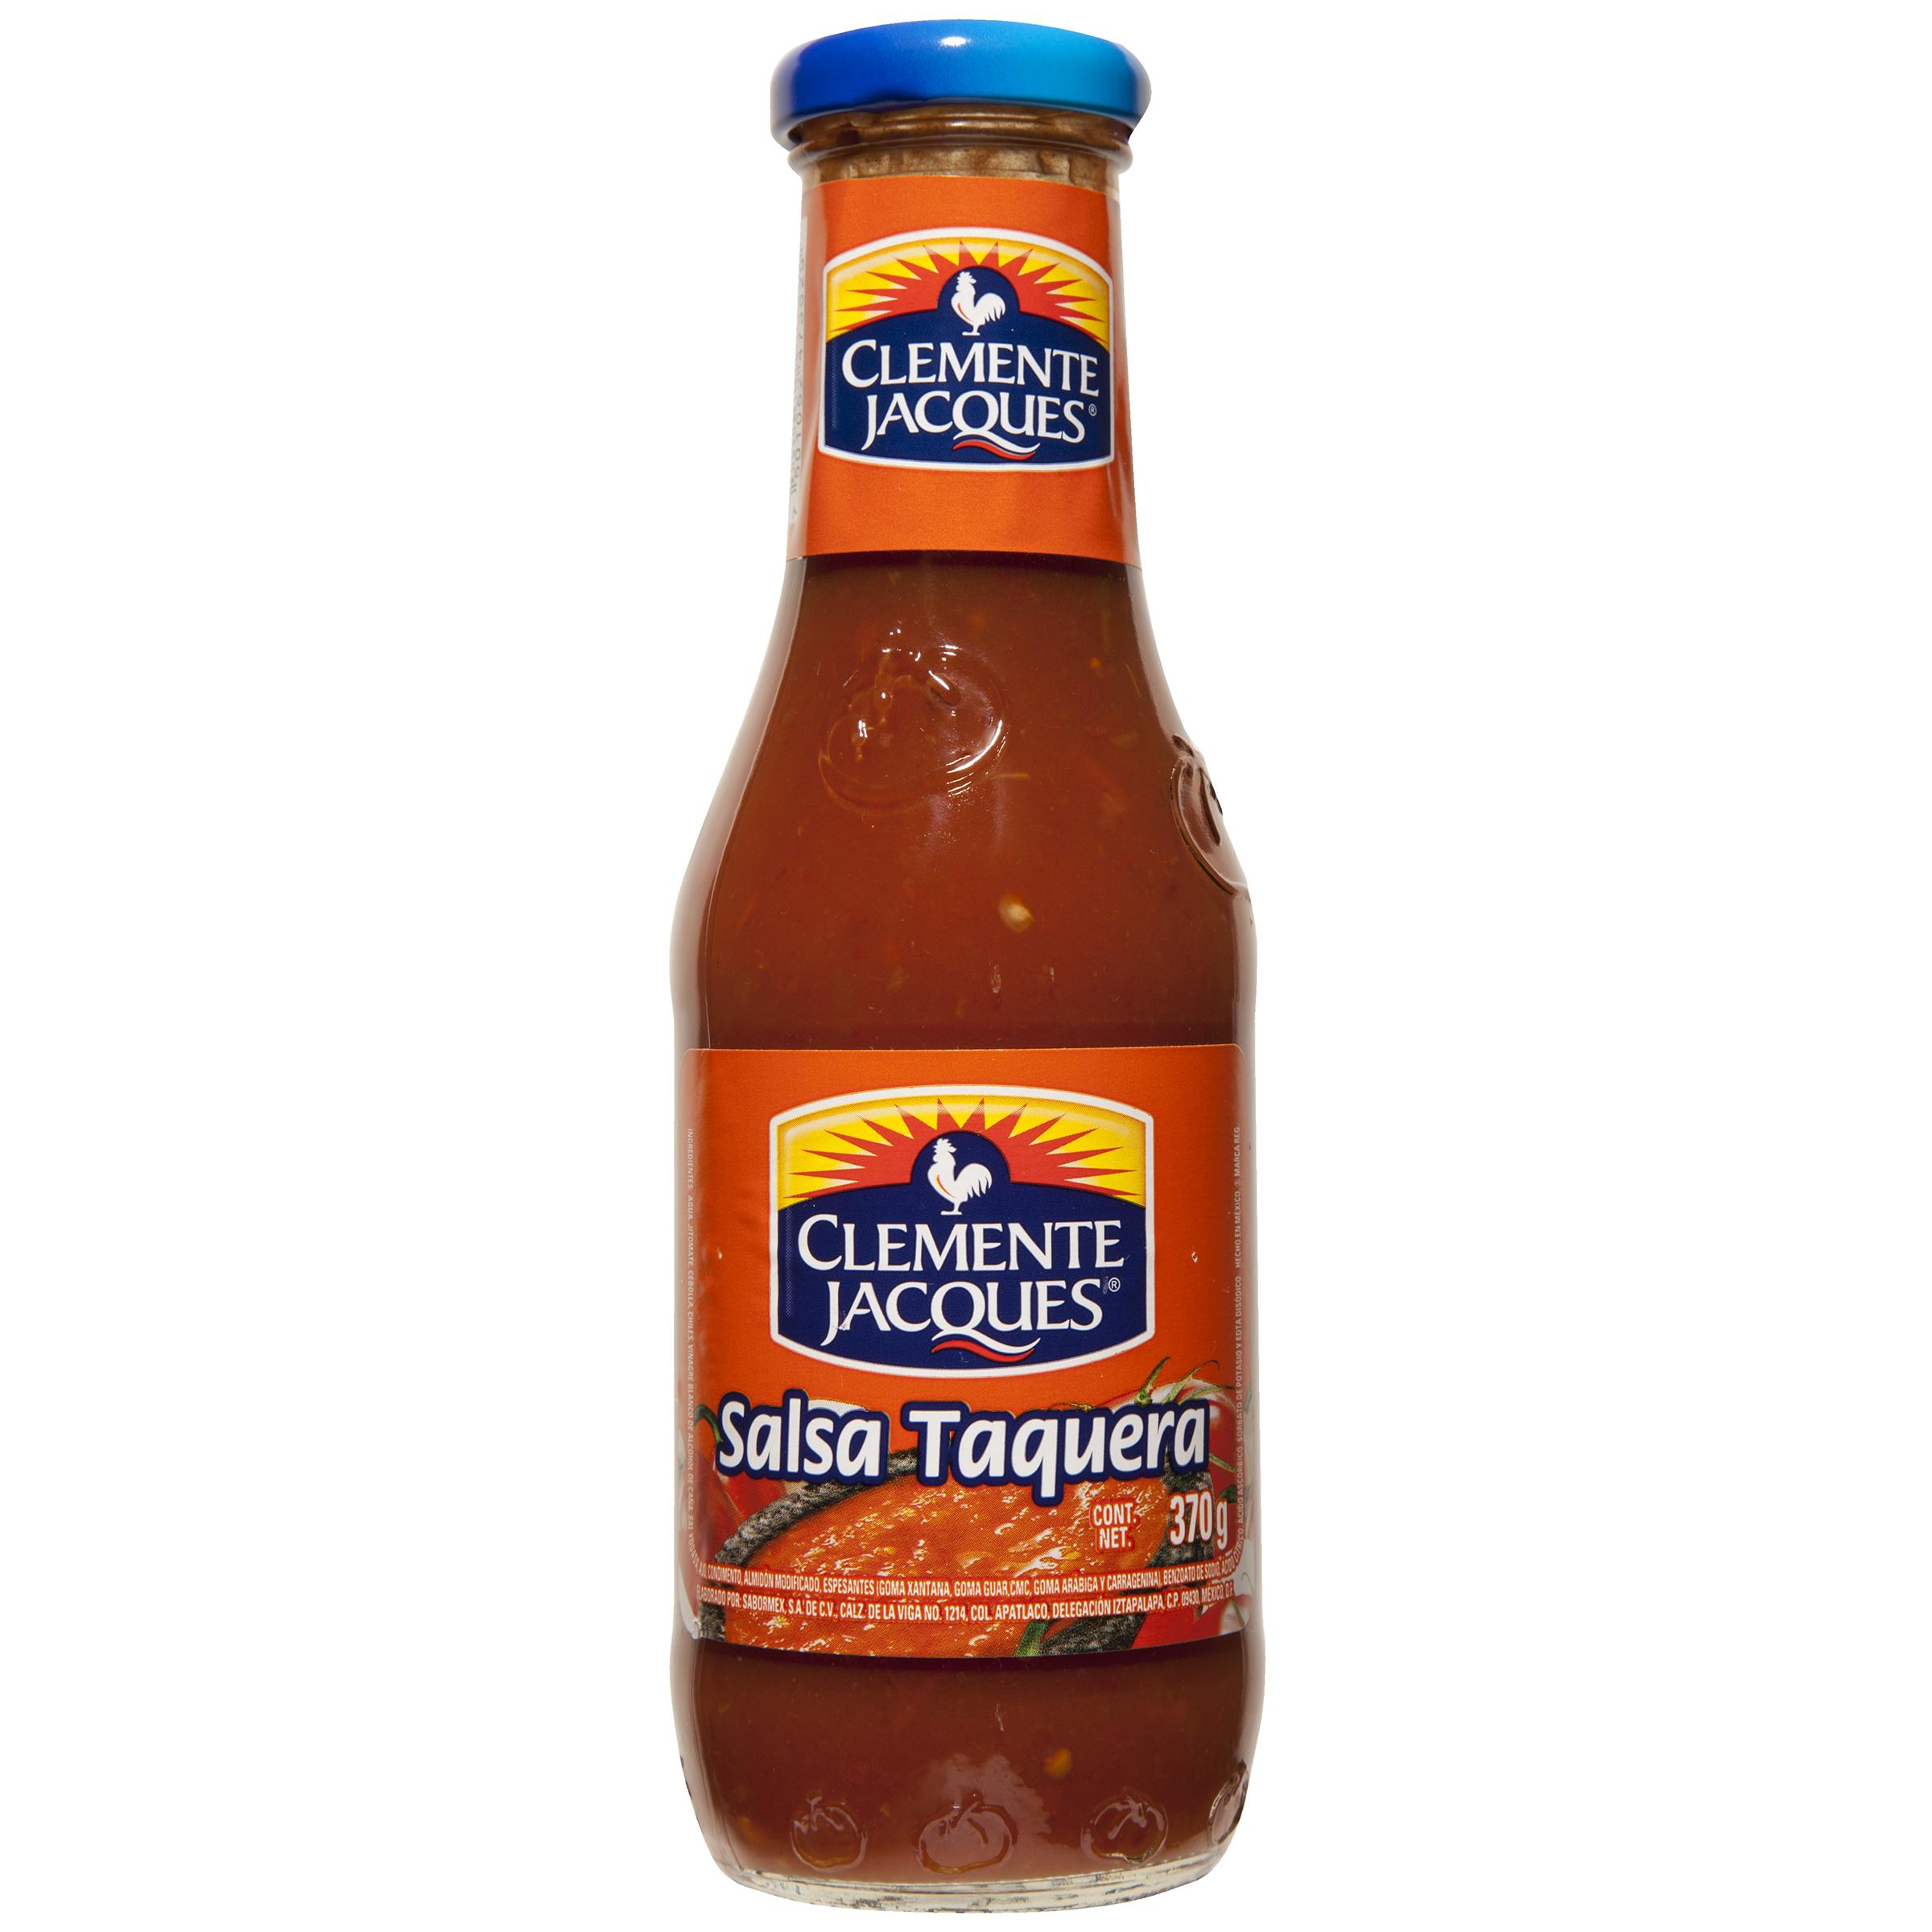 Salsa taquera 370ml clemente jacques 370ml Botella Cristal